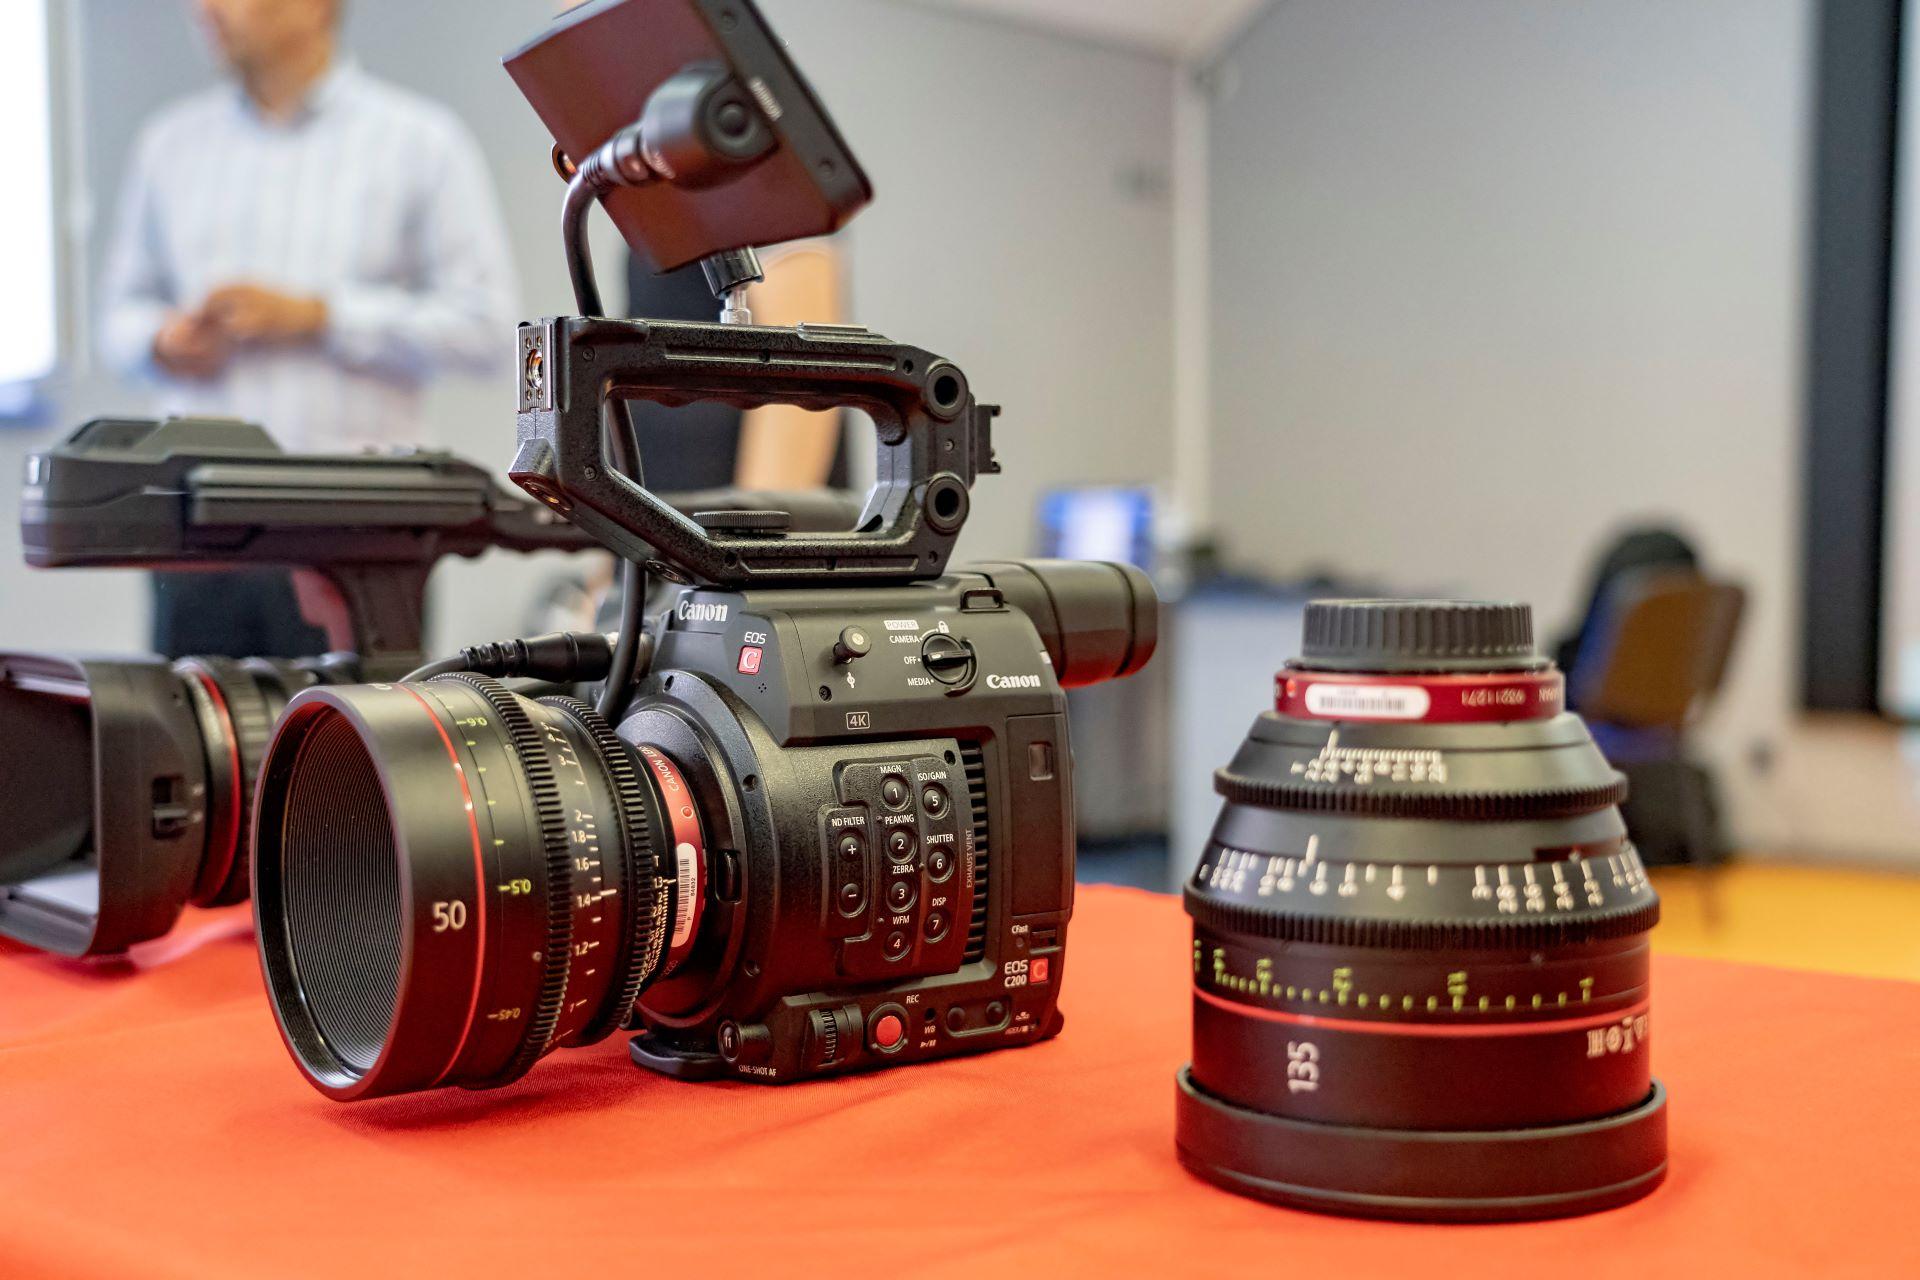 Canon EOS C200 03.08.19 Семинар Съемочная техника Canon. TVS Service LTD